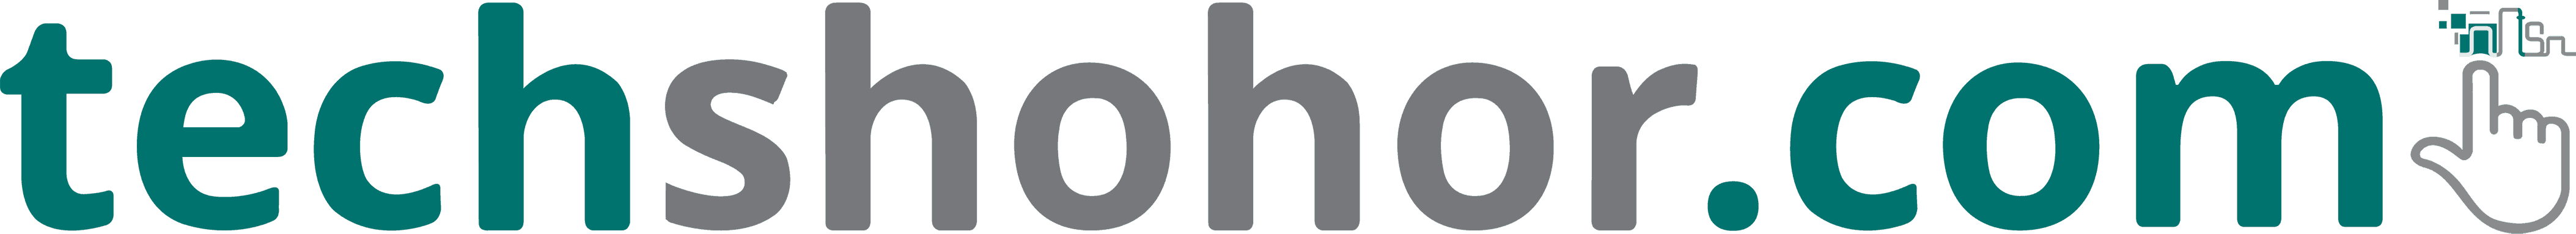 nshamimpro on techshohor